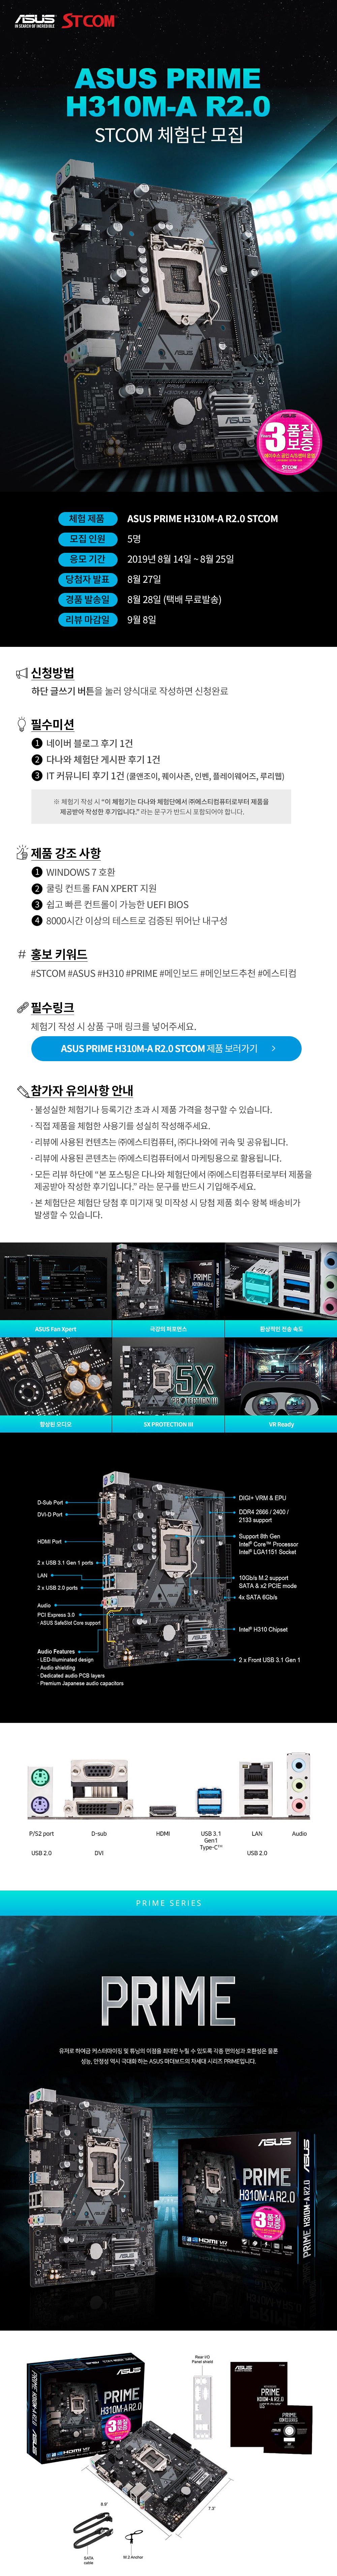 ASUS PRIME H310M-A R2.0 STCOM 체험단 모집 페이지